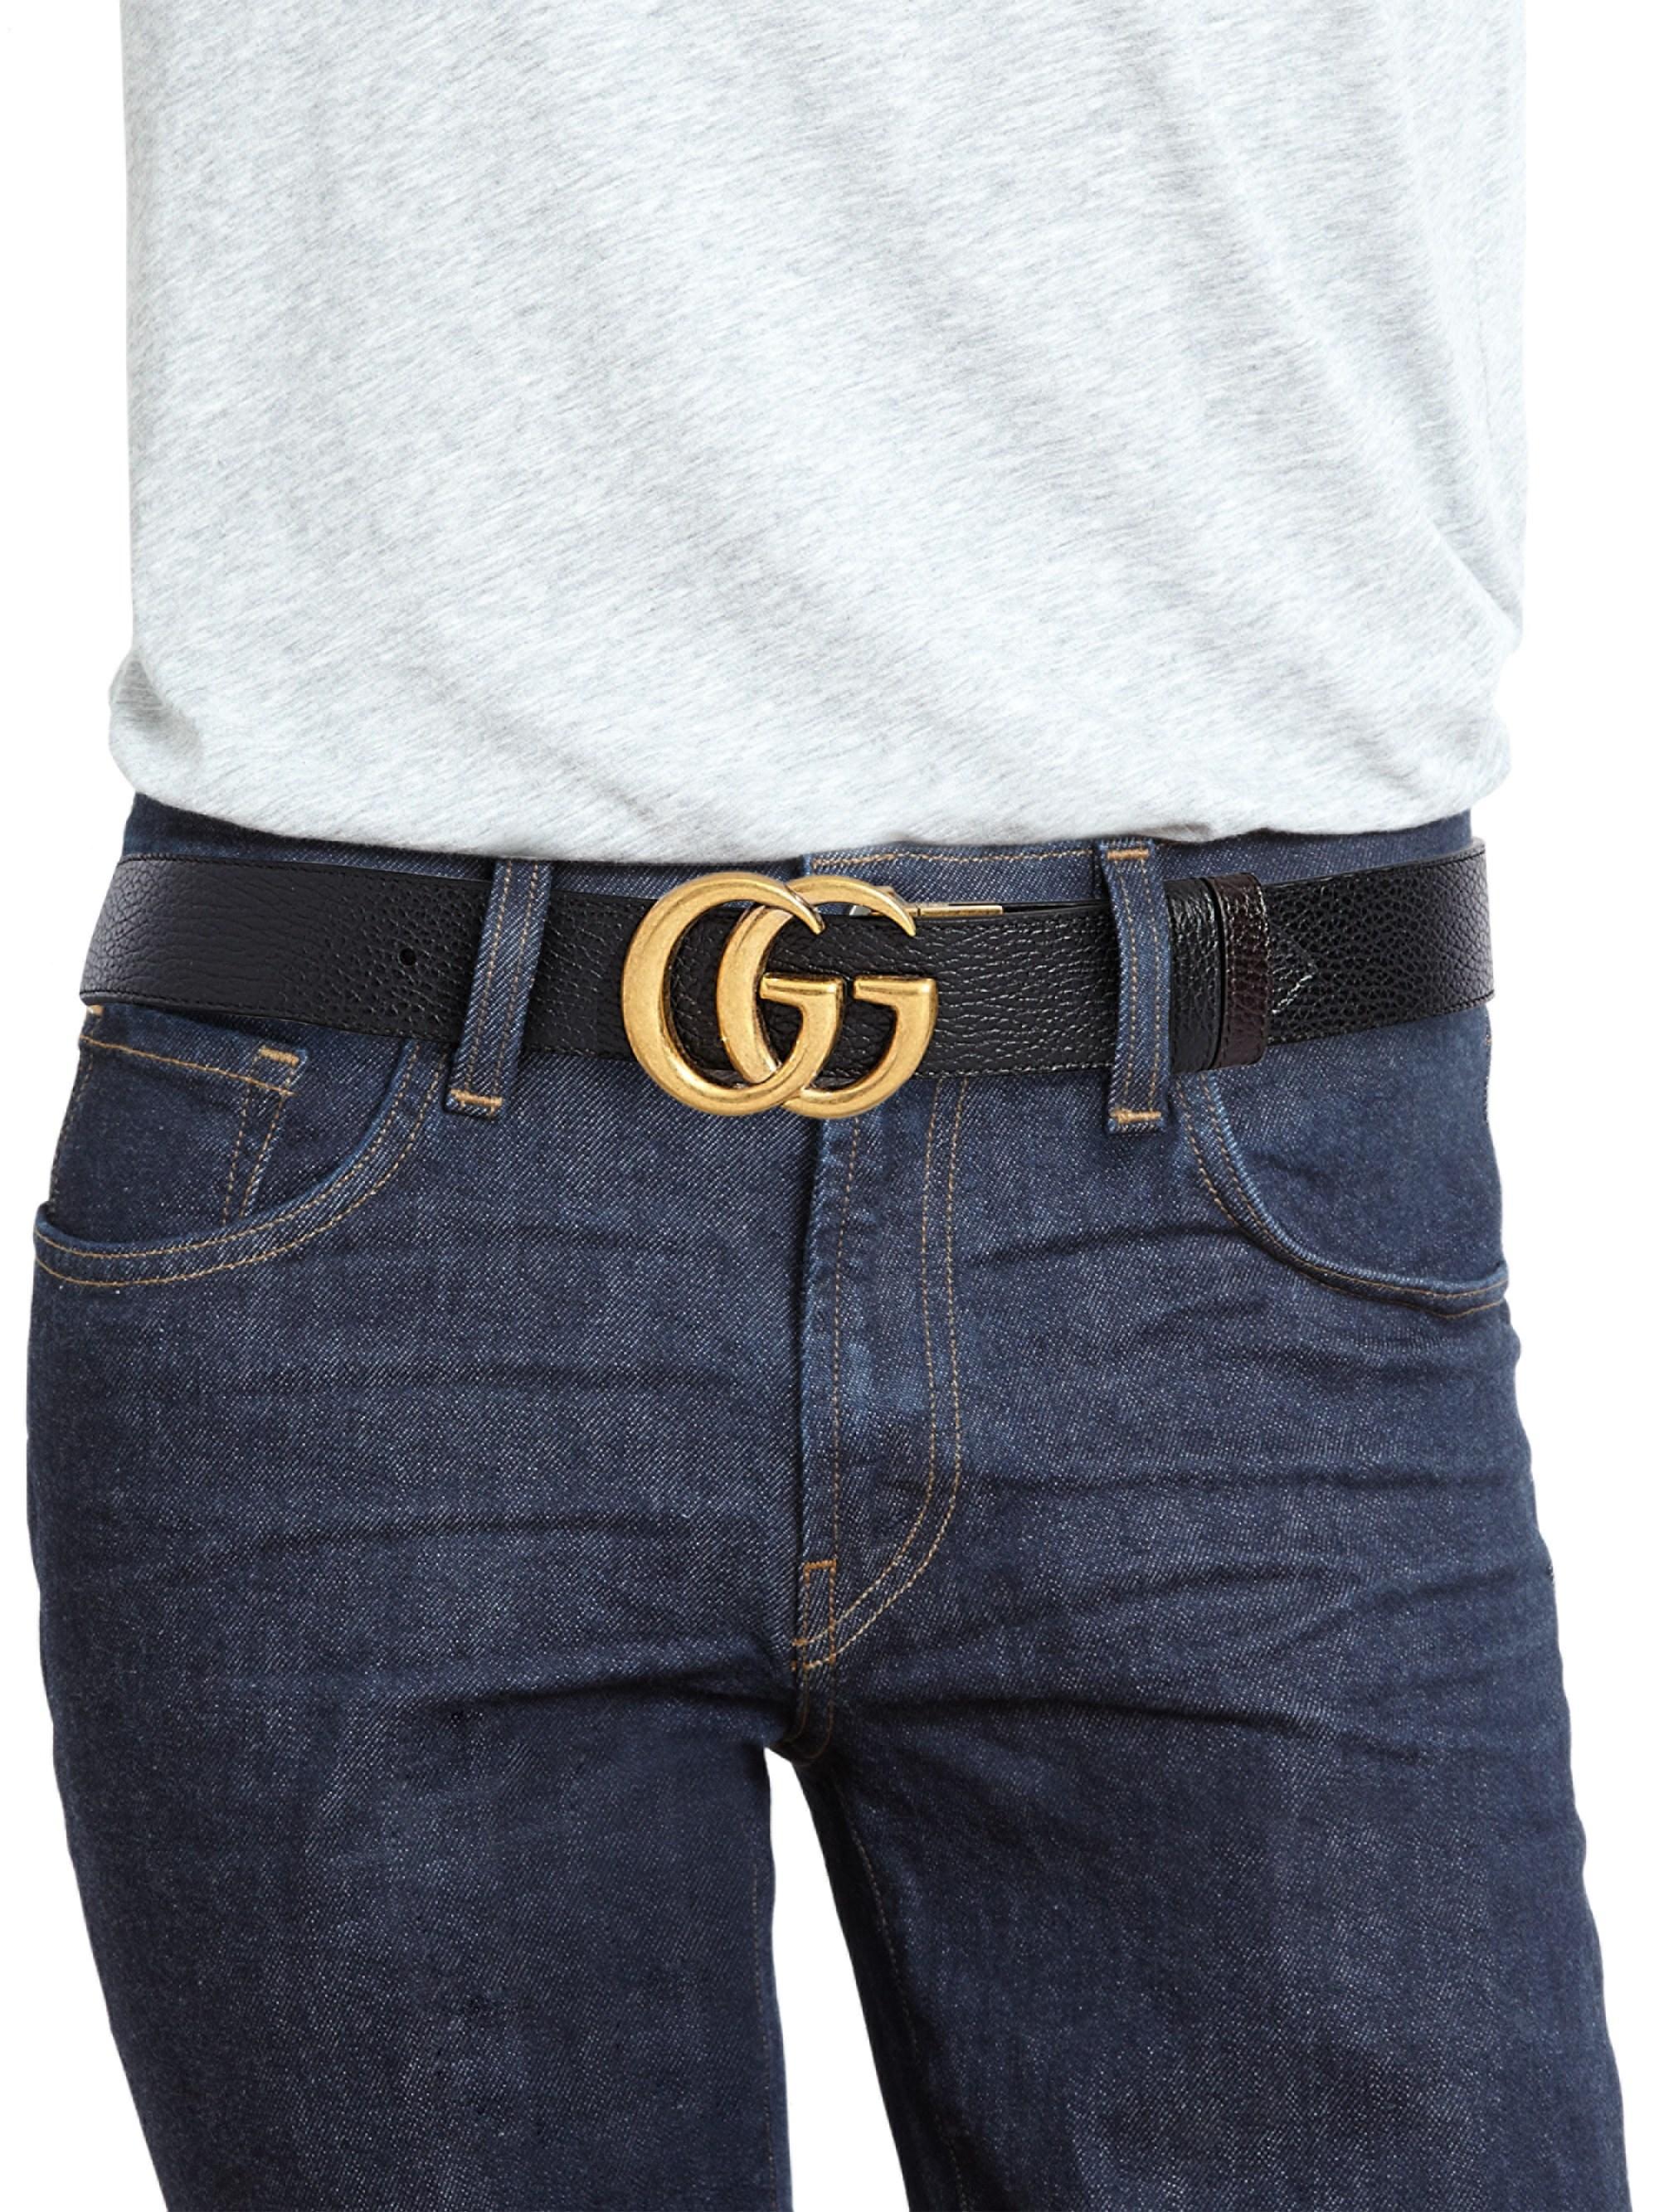 320cdf746 Gucci Interlocking GG Reversible Leather Belt for Men - Lyst